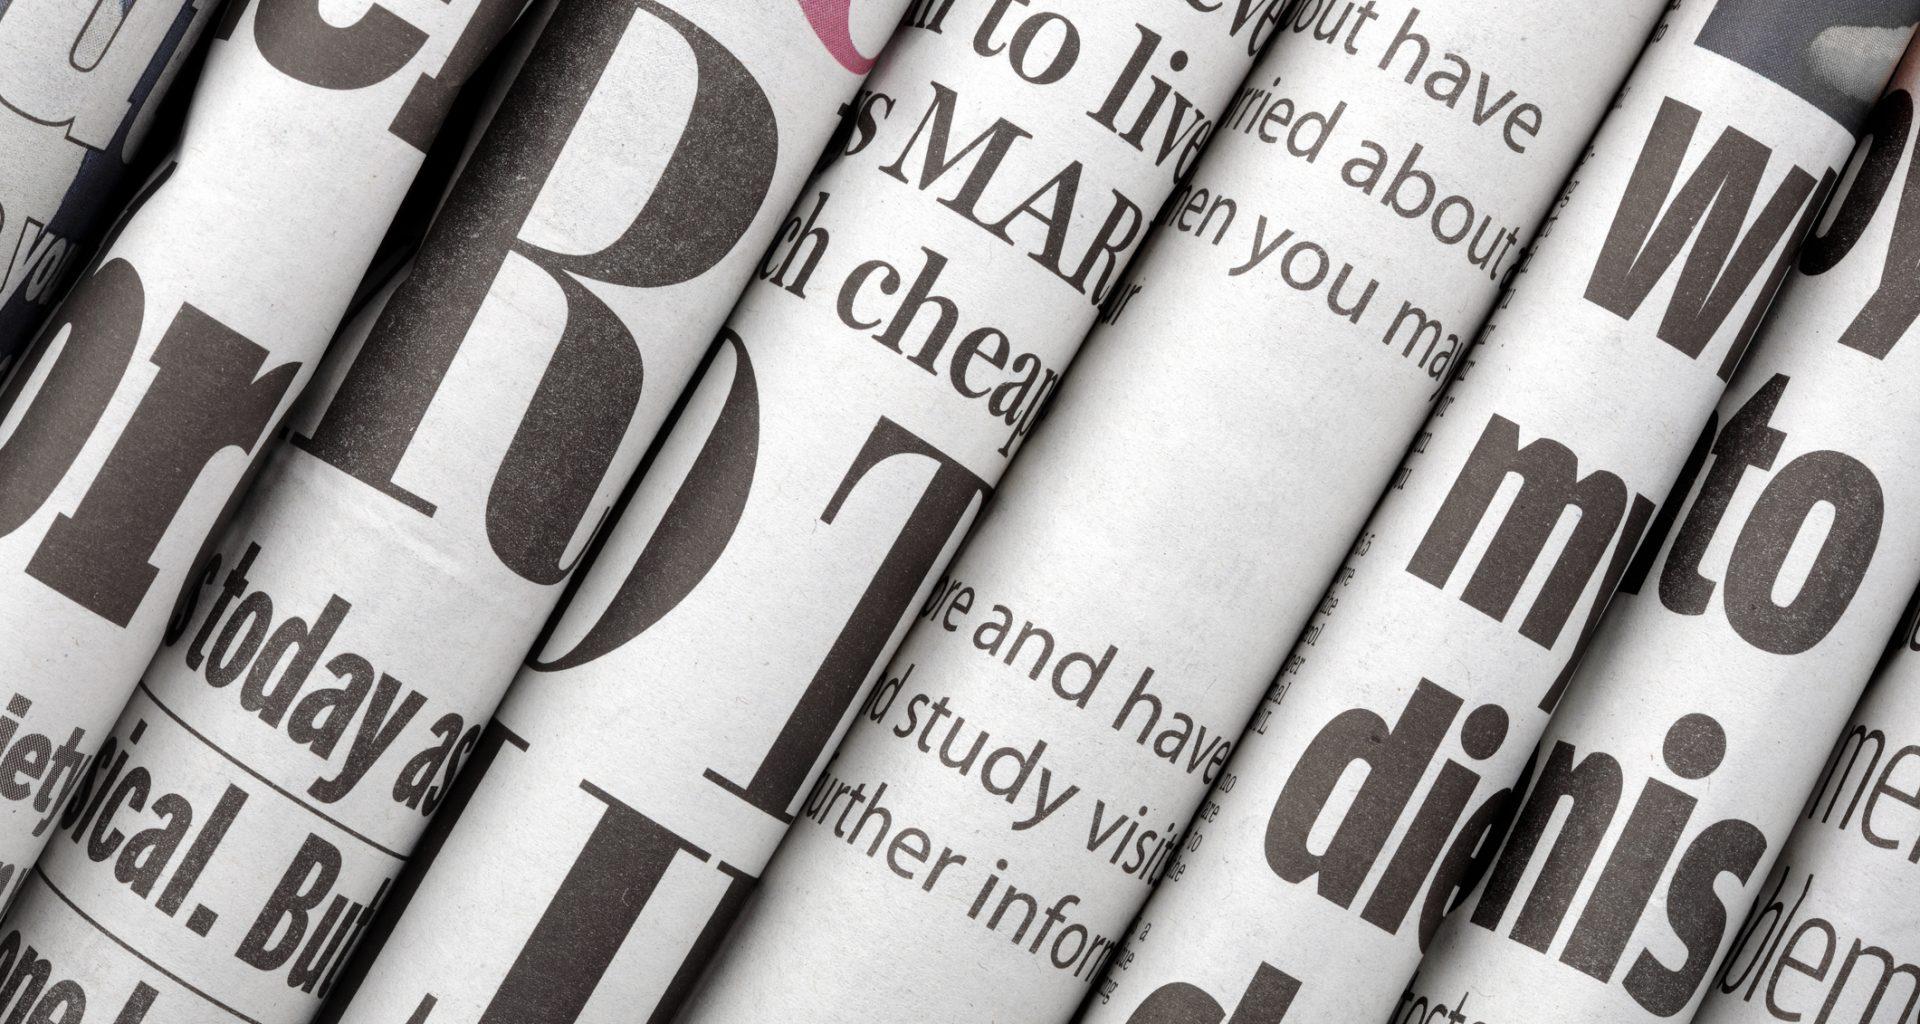 gazeteler-ana-akim-medya